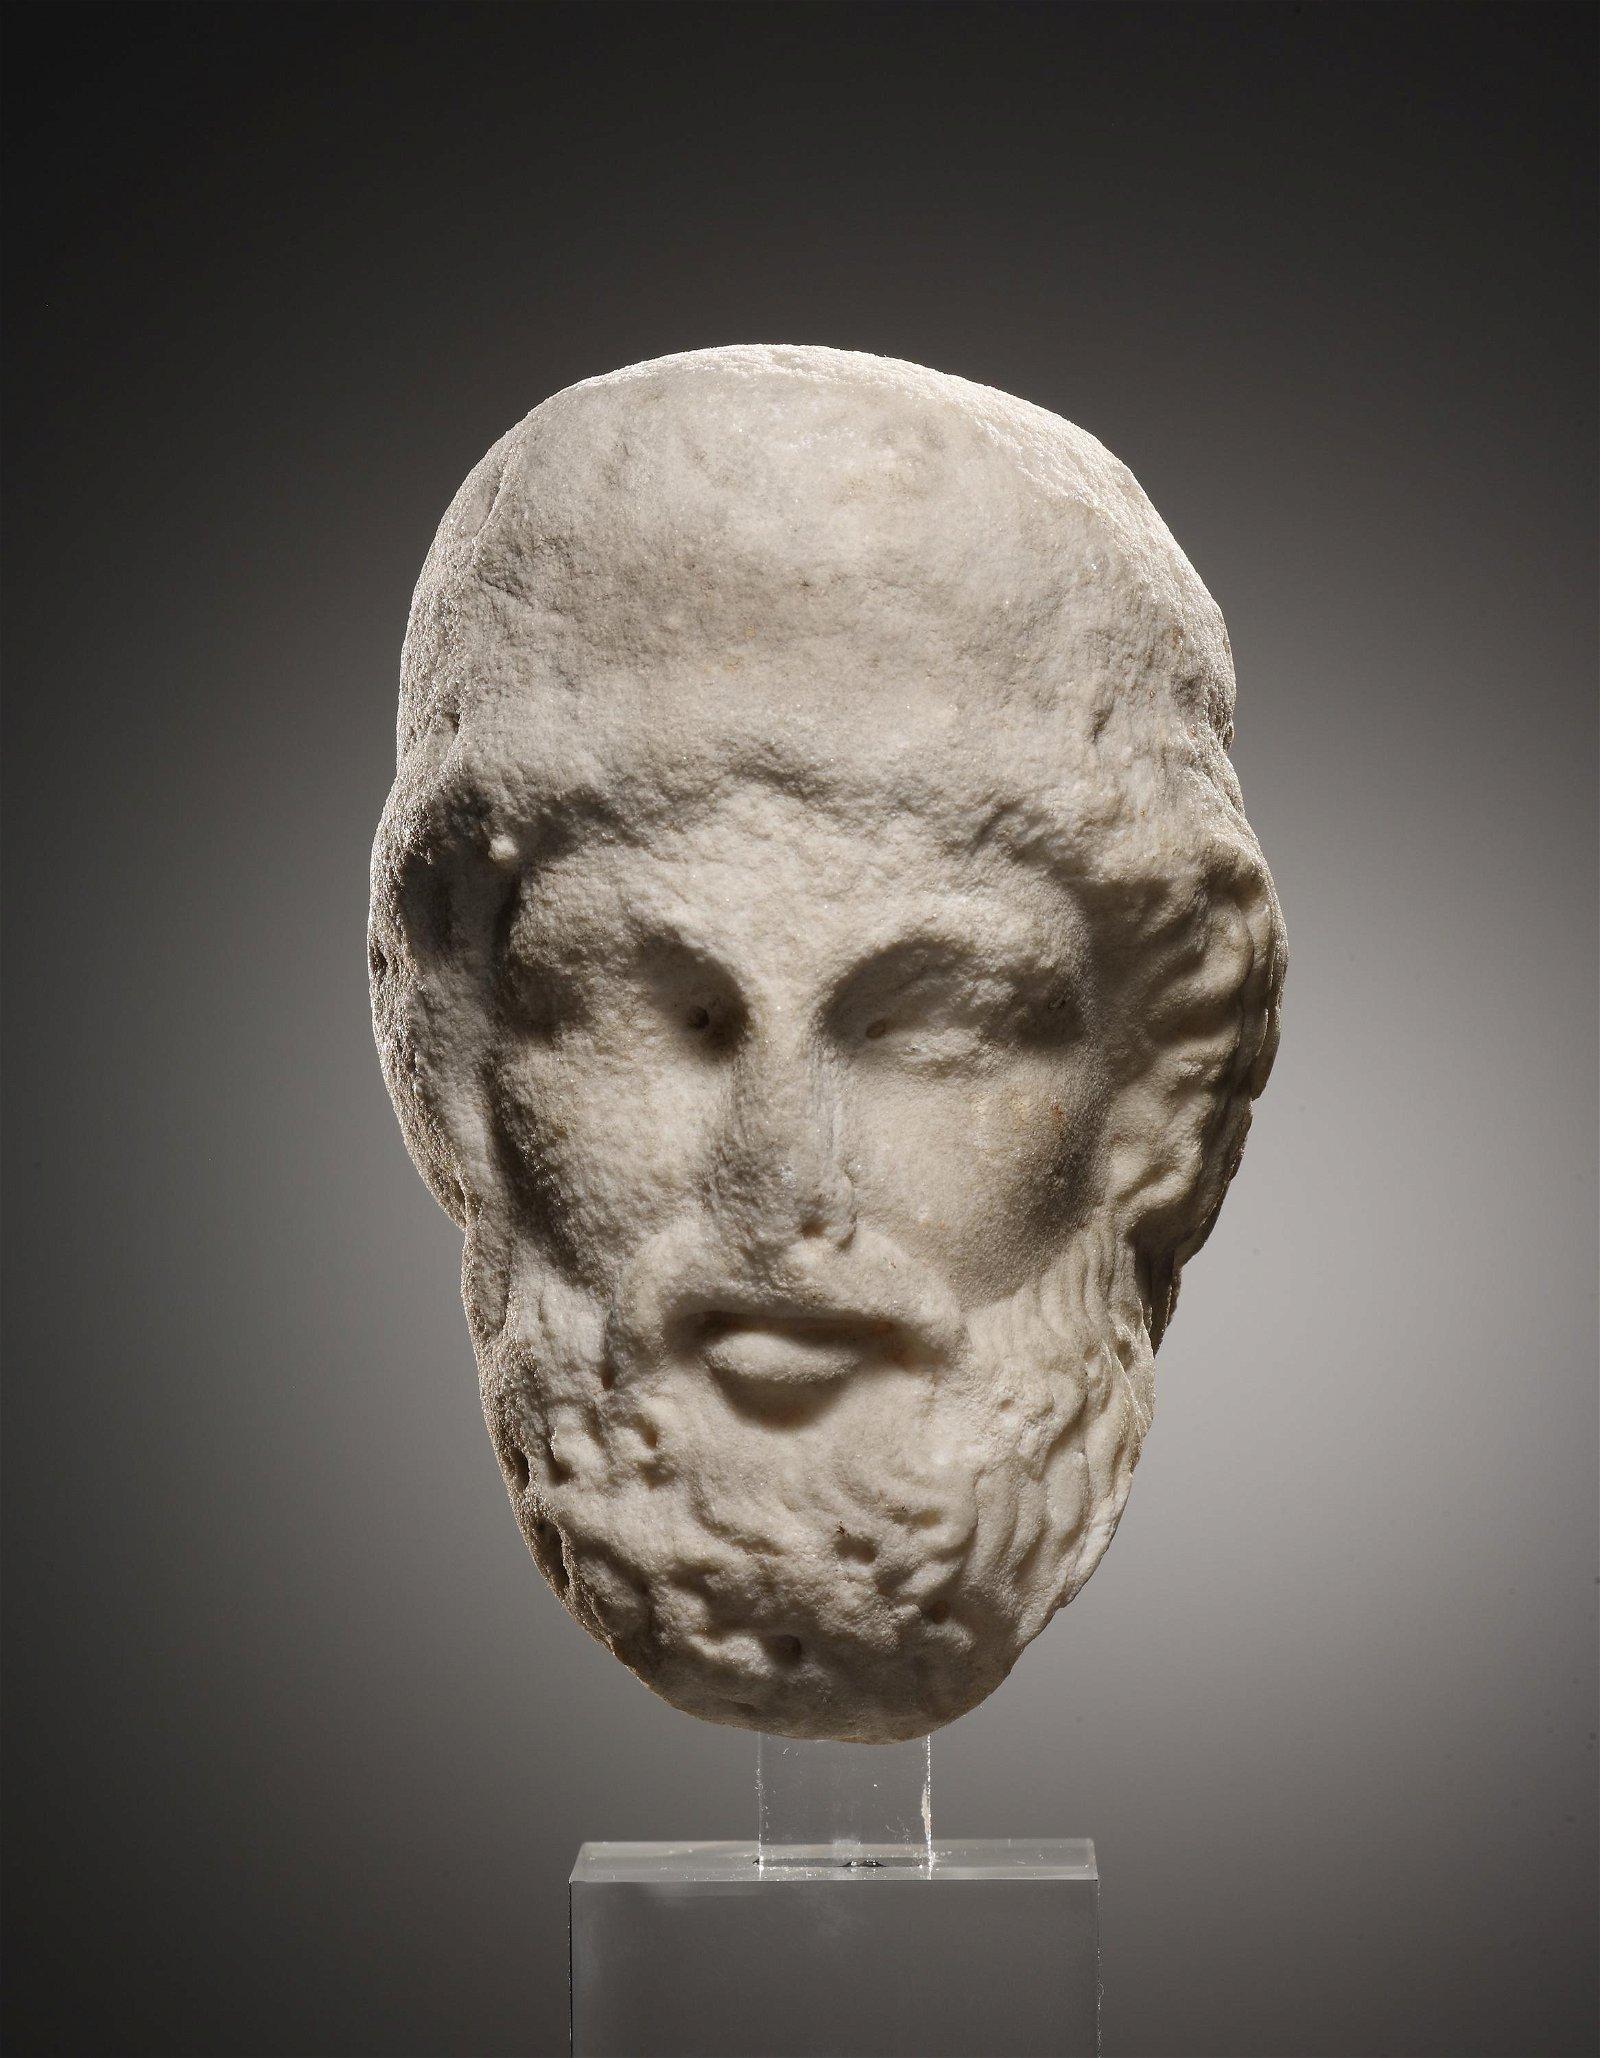 A Head of a Bearded Man, possibly Odysseus